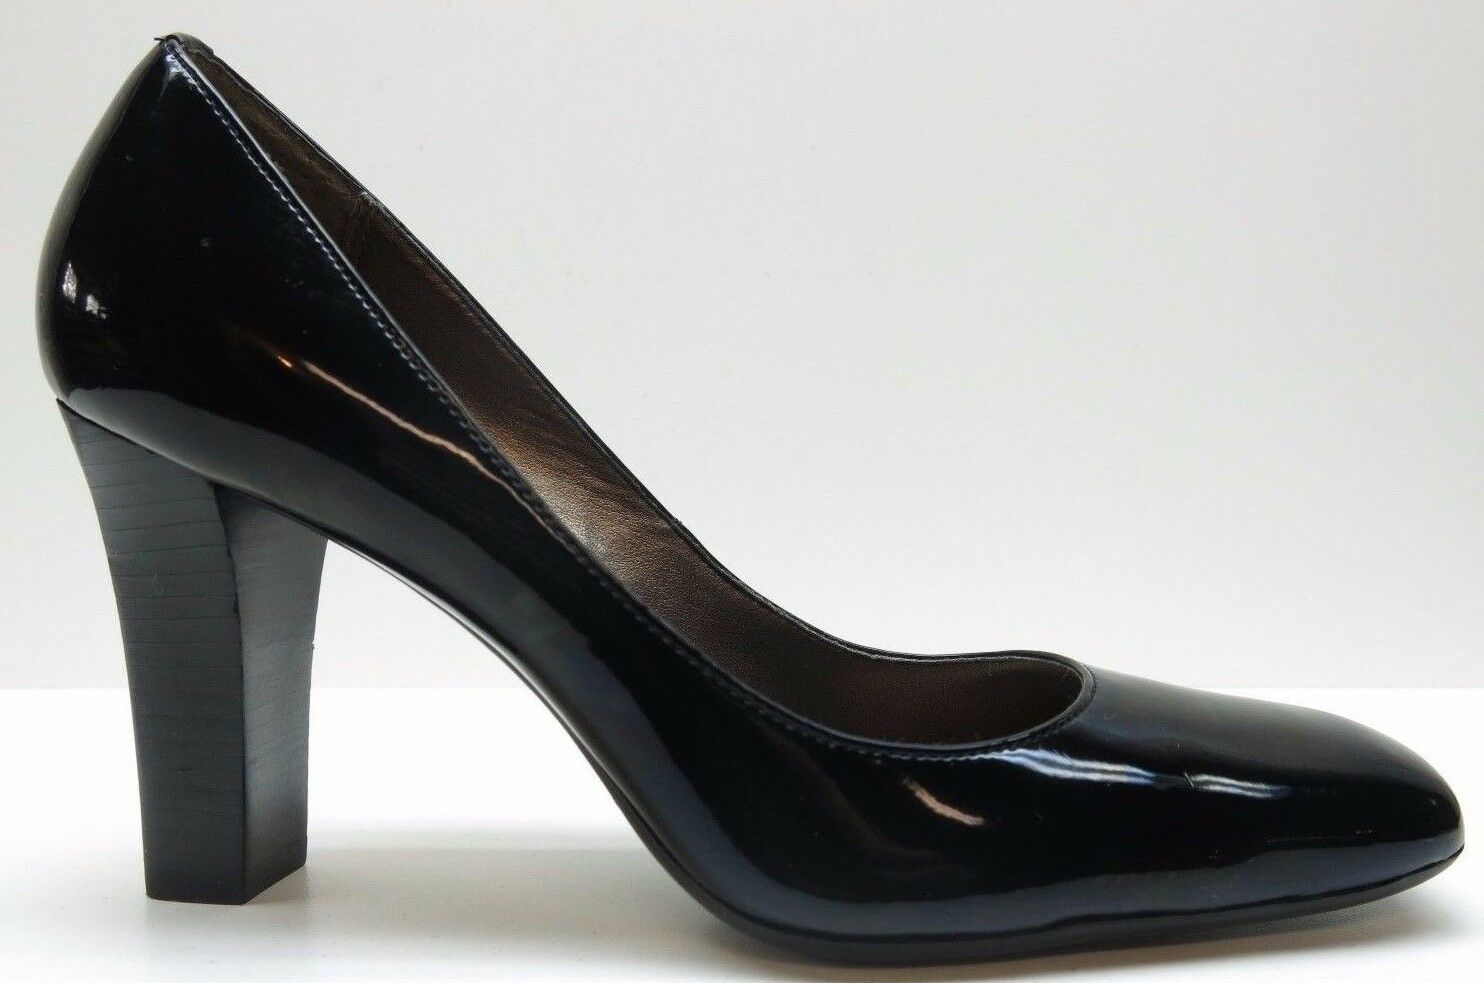 Circa Joan & David Black Patent Leather High 6.5 Heels Dress Pumps 6.5M 6.5 High MSRP $89 762ce8